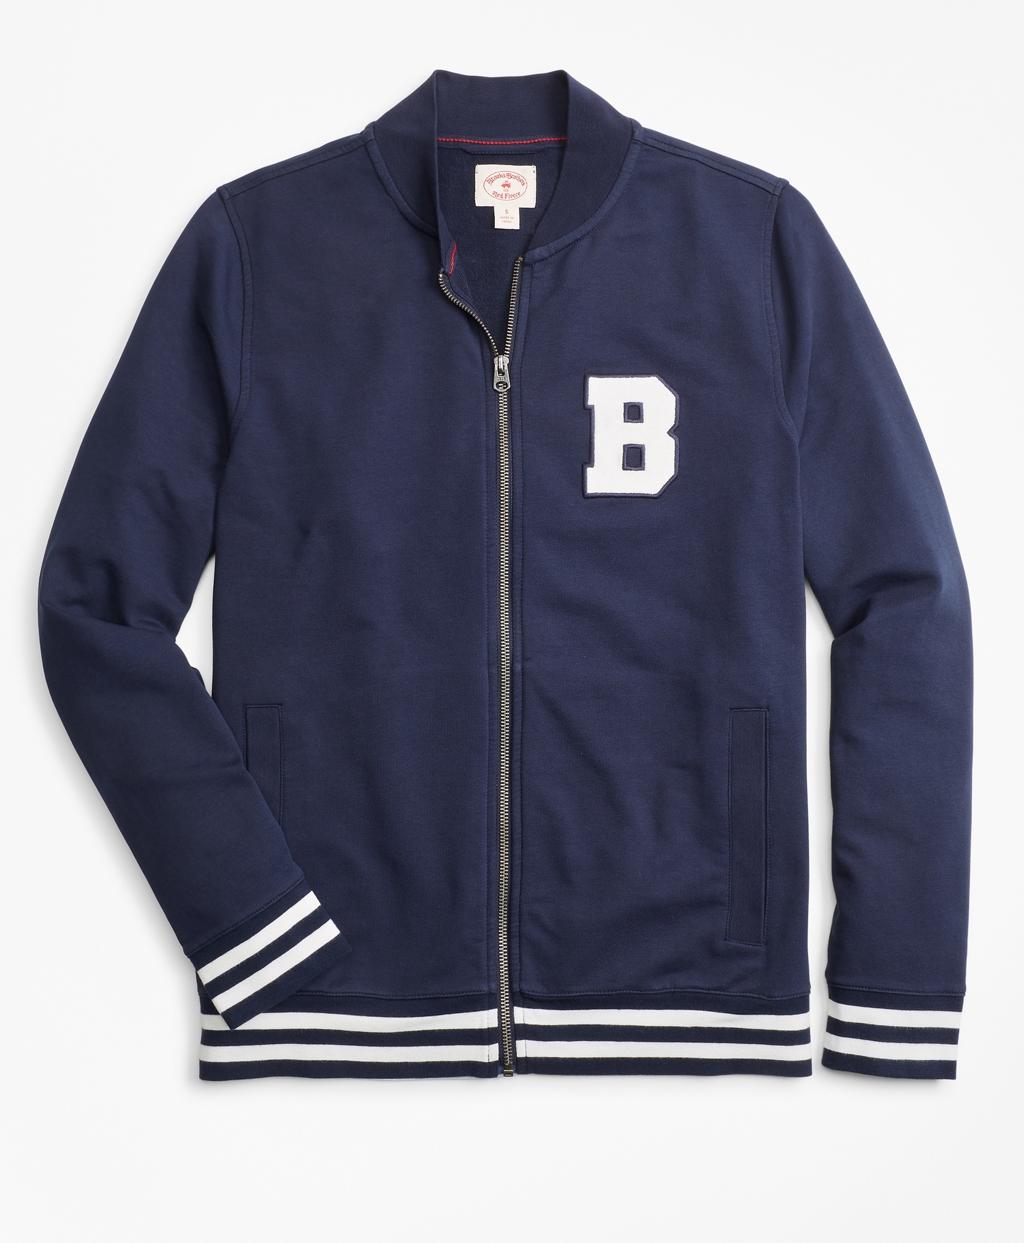 50s Men's Jackets| Greaser Jackets, Leather, Bomber, Gaberdine Brooks Brothers Mens French Terry Letterman Lightweight Baseball Jacket $79.50 AT vintagedancer.com